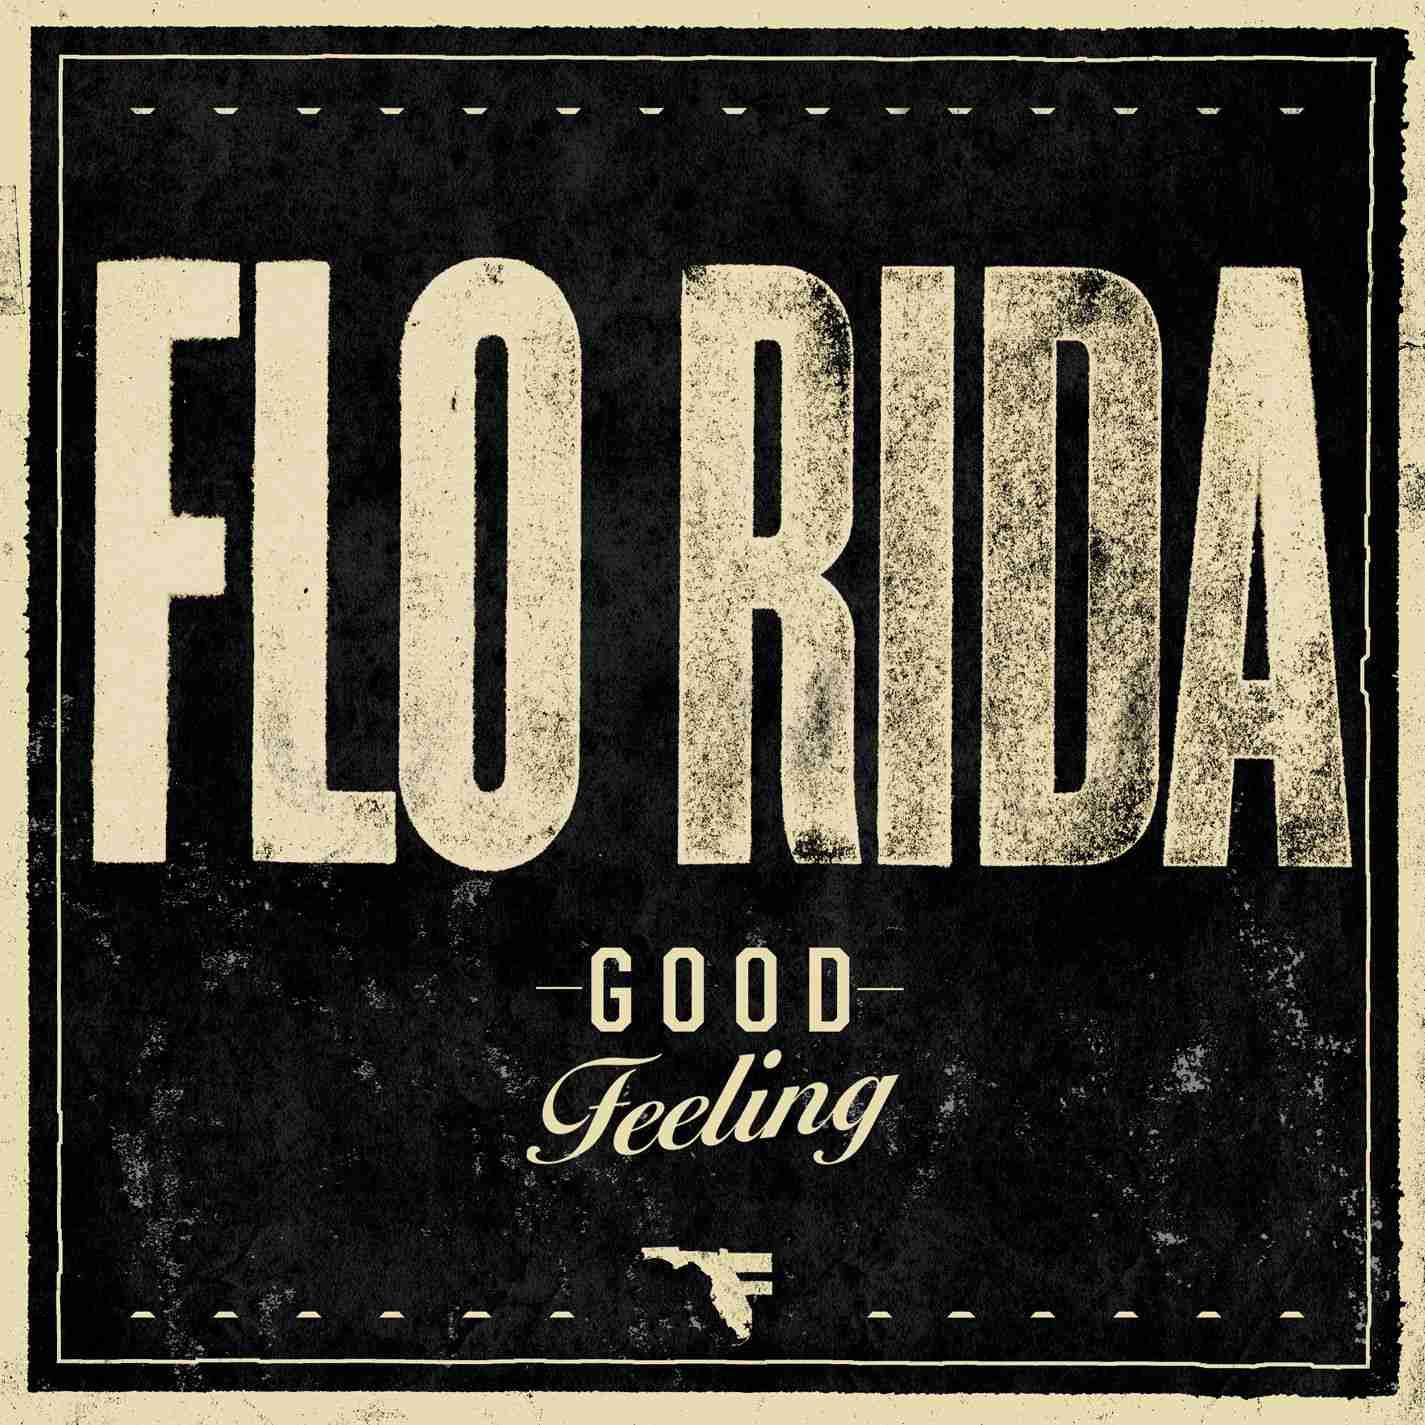 Flo Rida Good Feeling